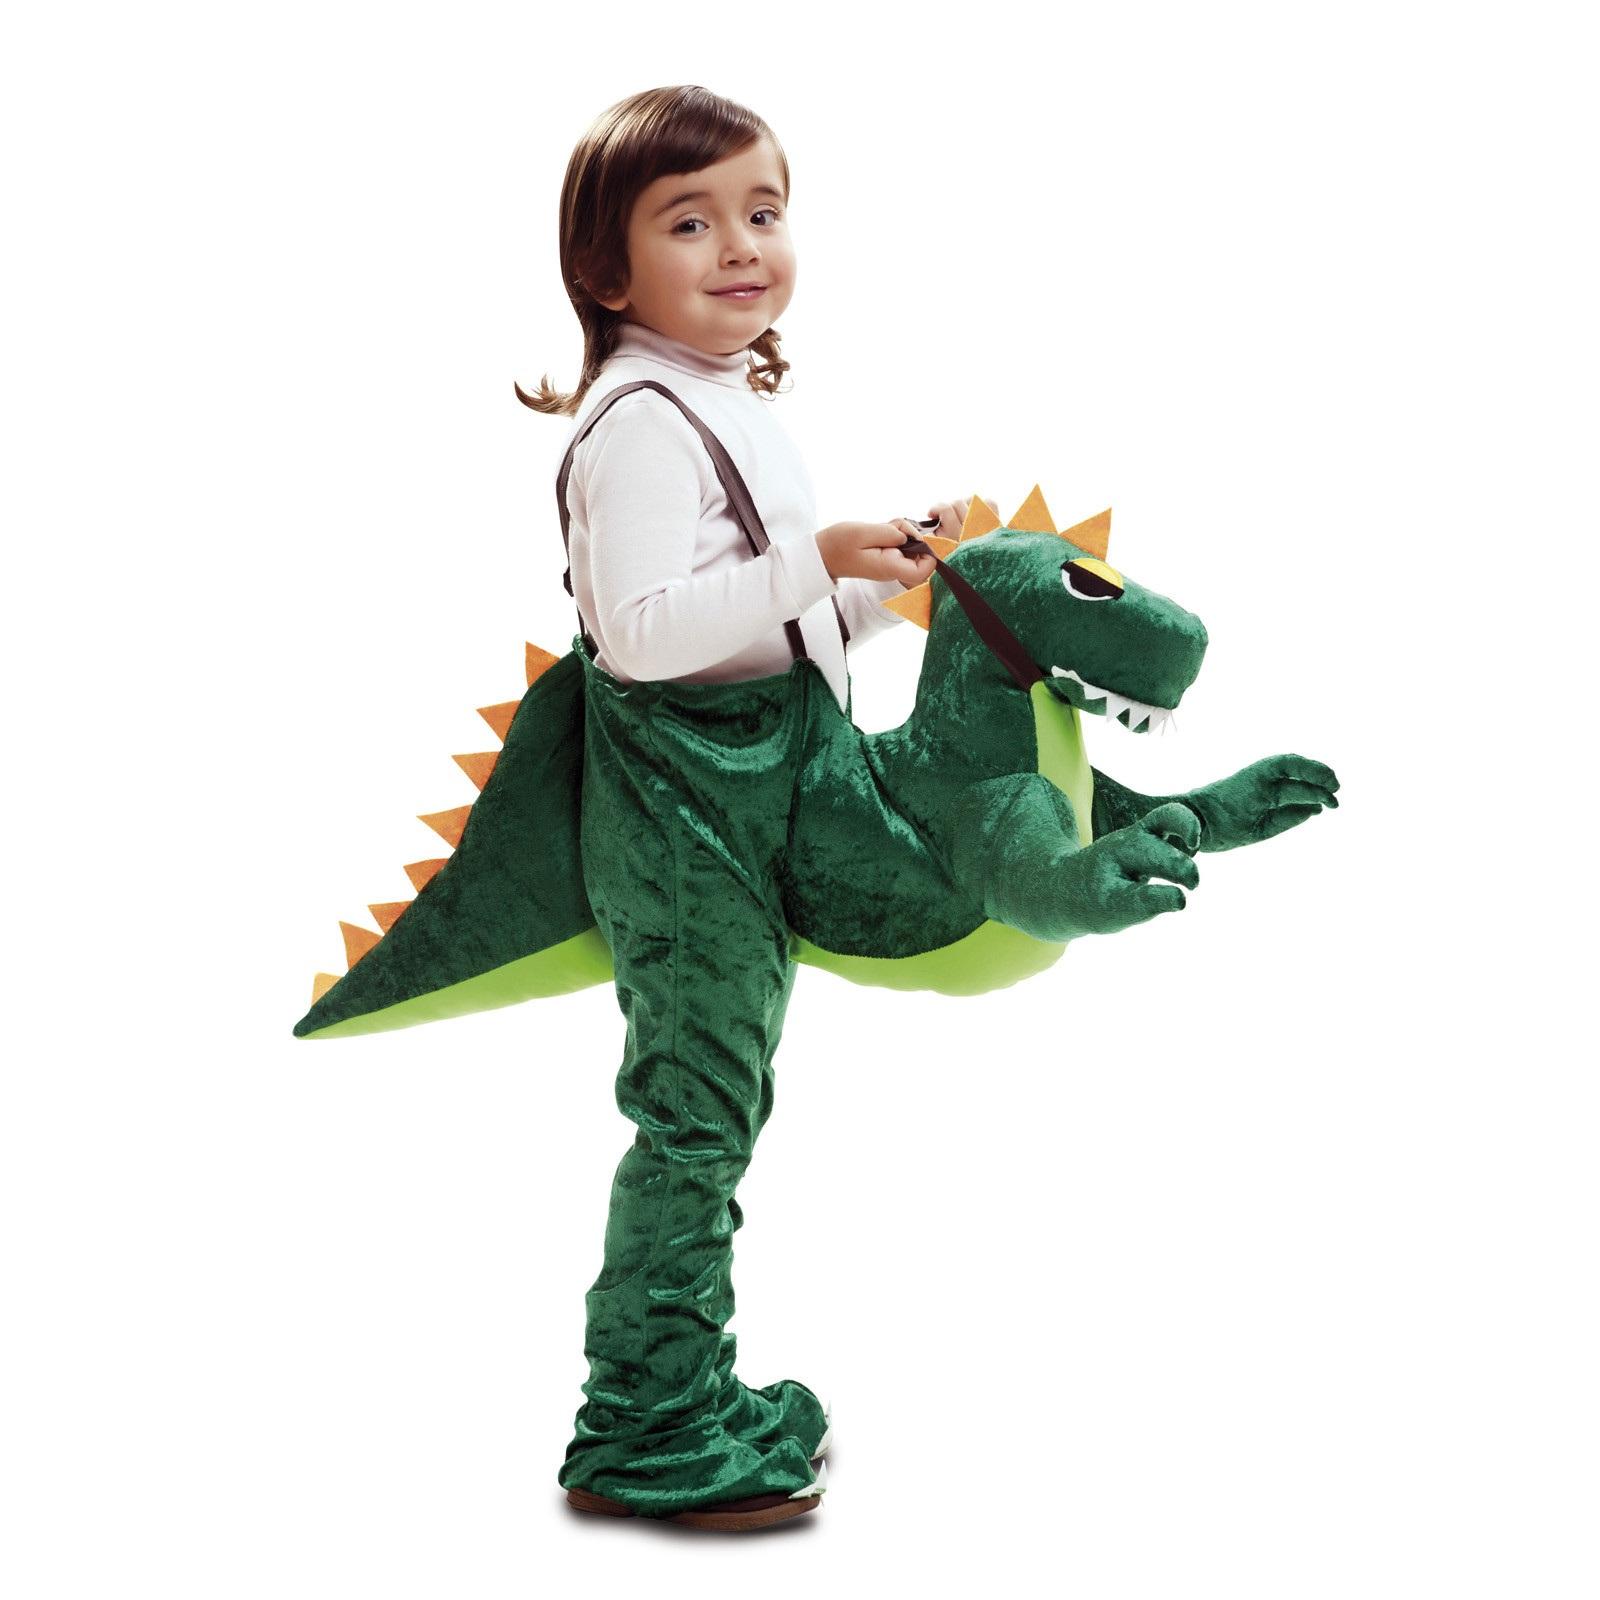 disfraz rino rider niño 202662mom - DISFRAZ DE DINO RIDER  INFANTIL